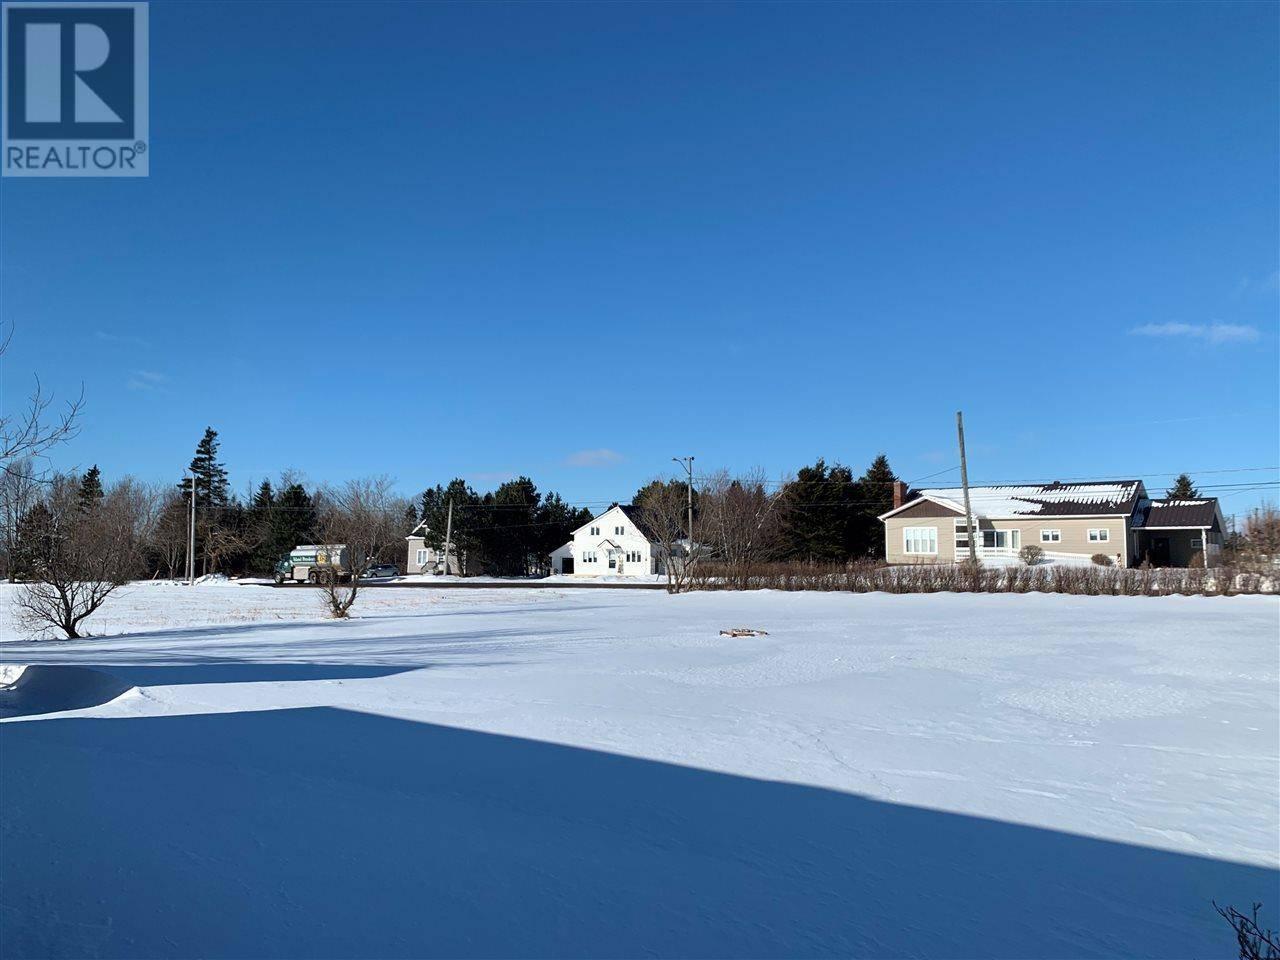 Residential property for sale at 22 Glenn Dr Summerside Prince Edward Island - MLS: 202001680